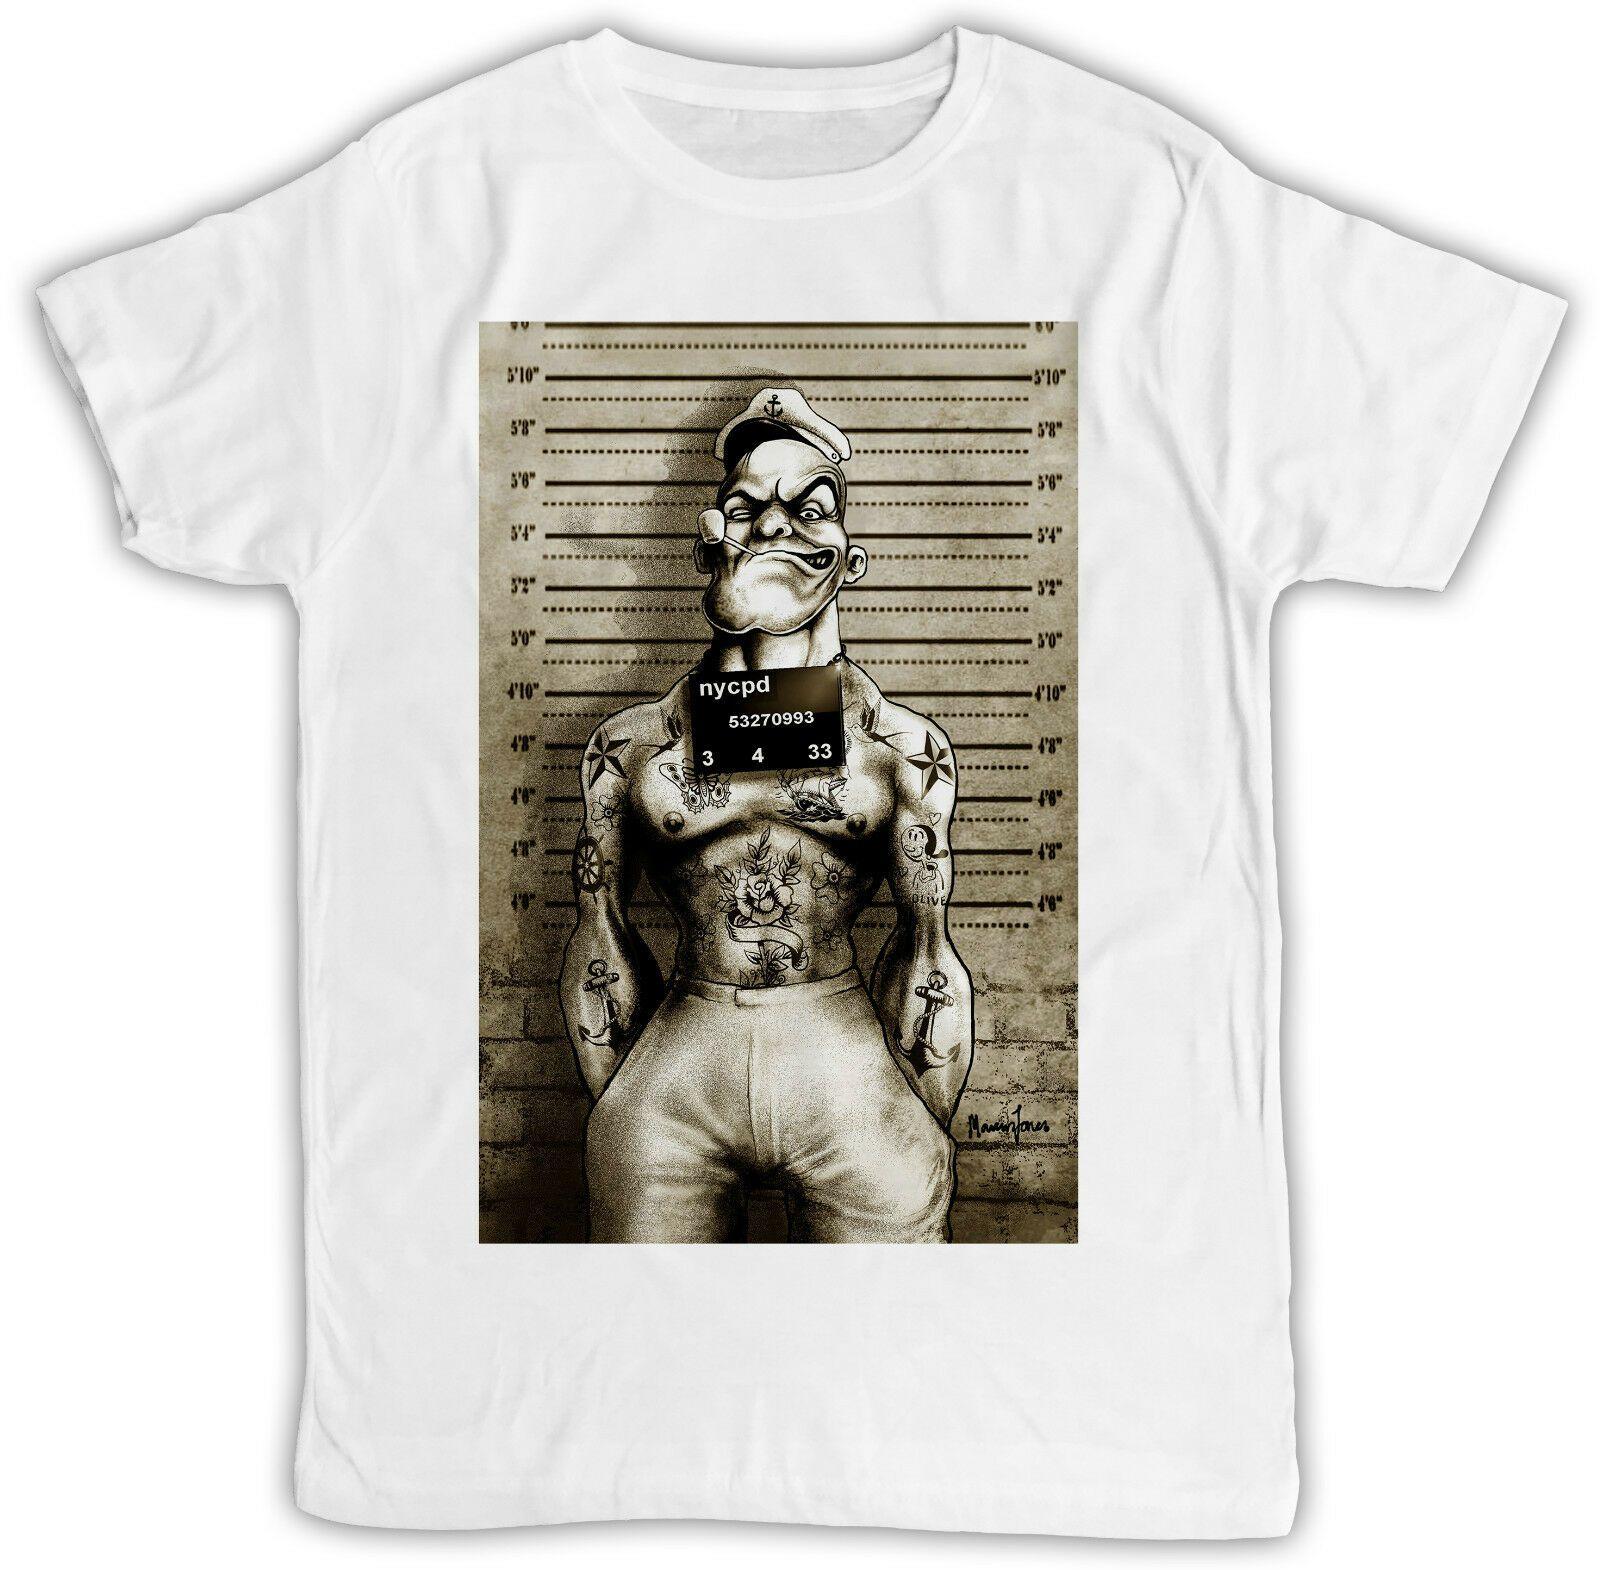 POPEYE TATTOO MUGSHOT POSTER IDEAL BIRTHDAY GIFT COOL SHORT SLEEVE MENS T SHIRT Cheap Wholesale Tees Summer MenS Fashion Tee Humorous Shirts